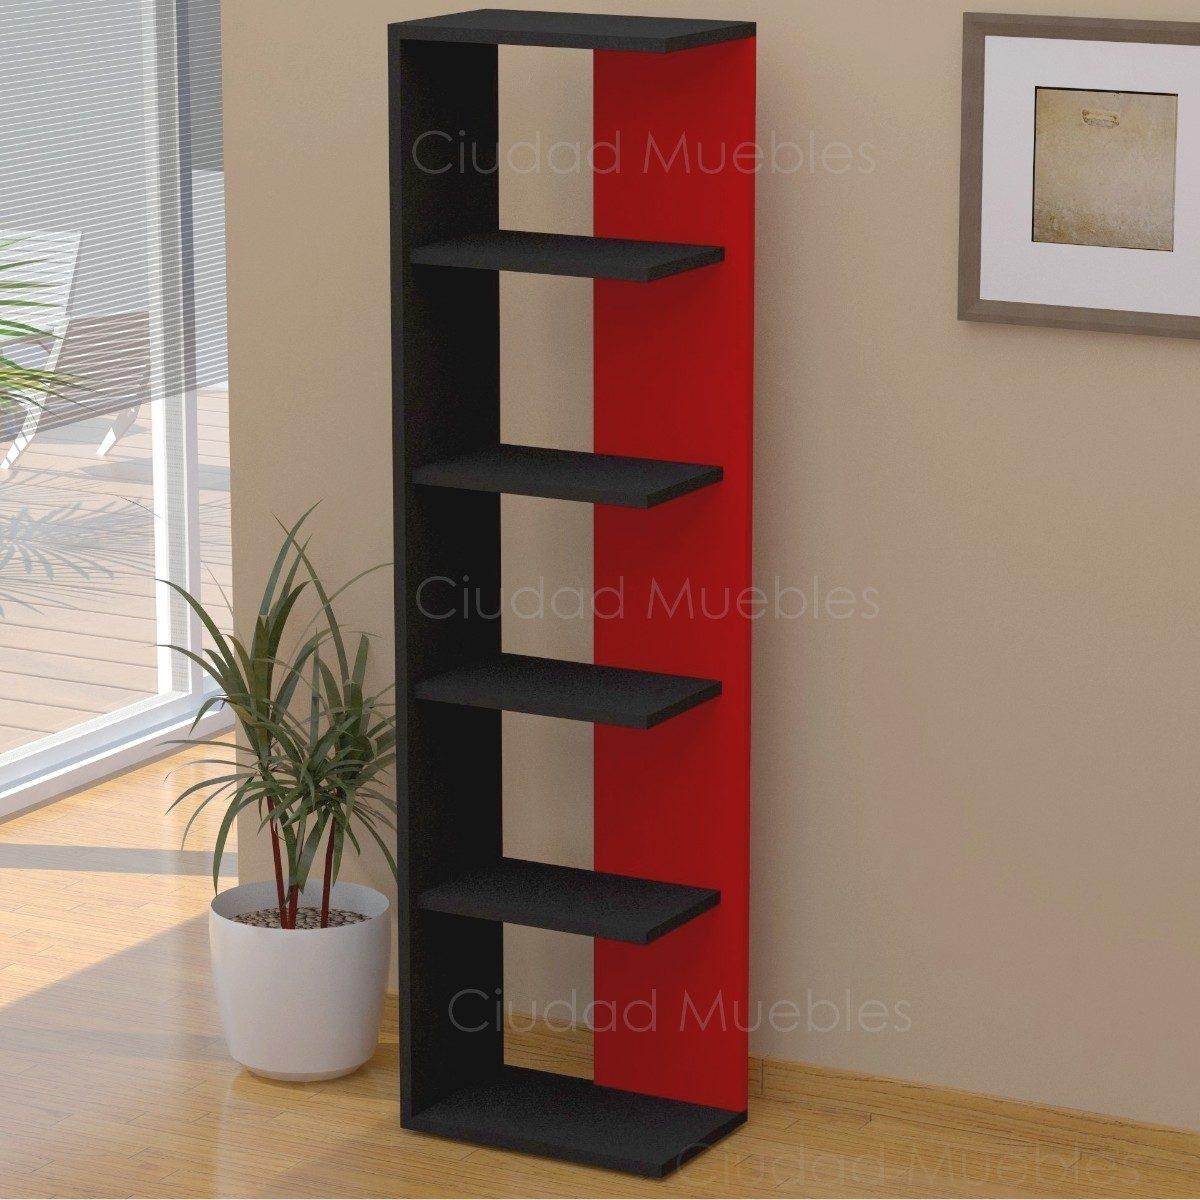 Biblioteca estante de melamina s 160 00 en mercado libre - Estantes para armarios empotrados ...